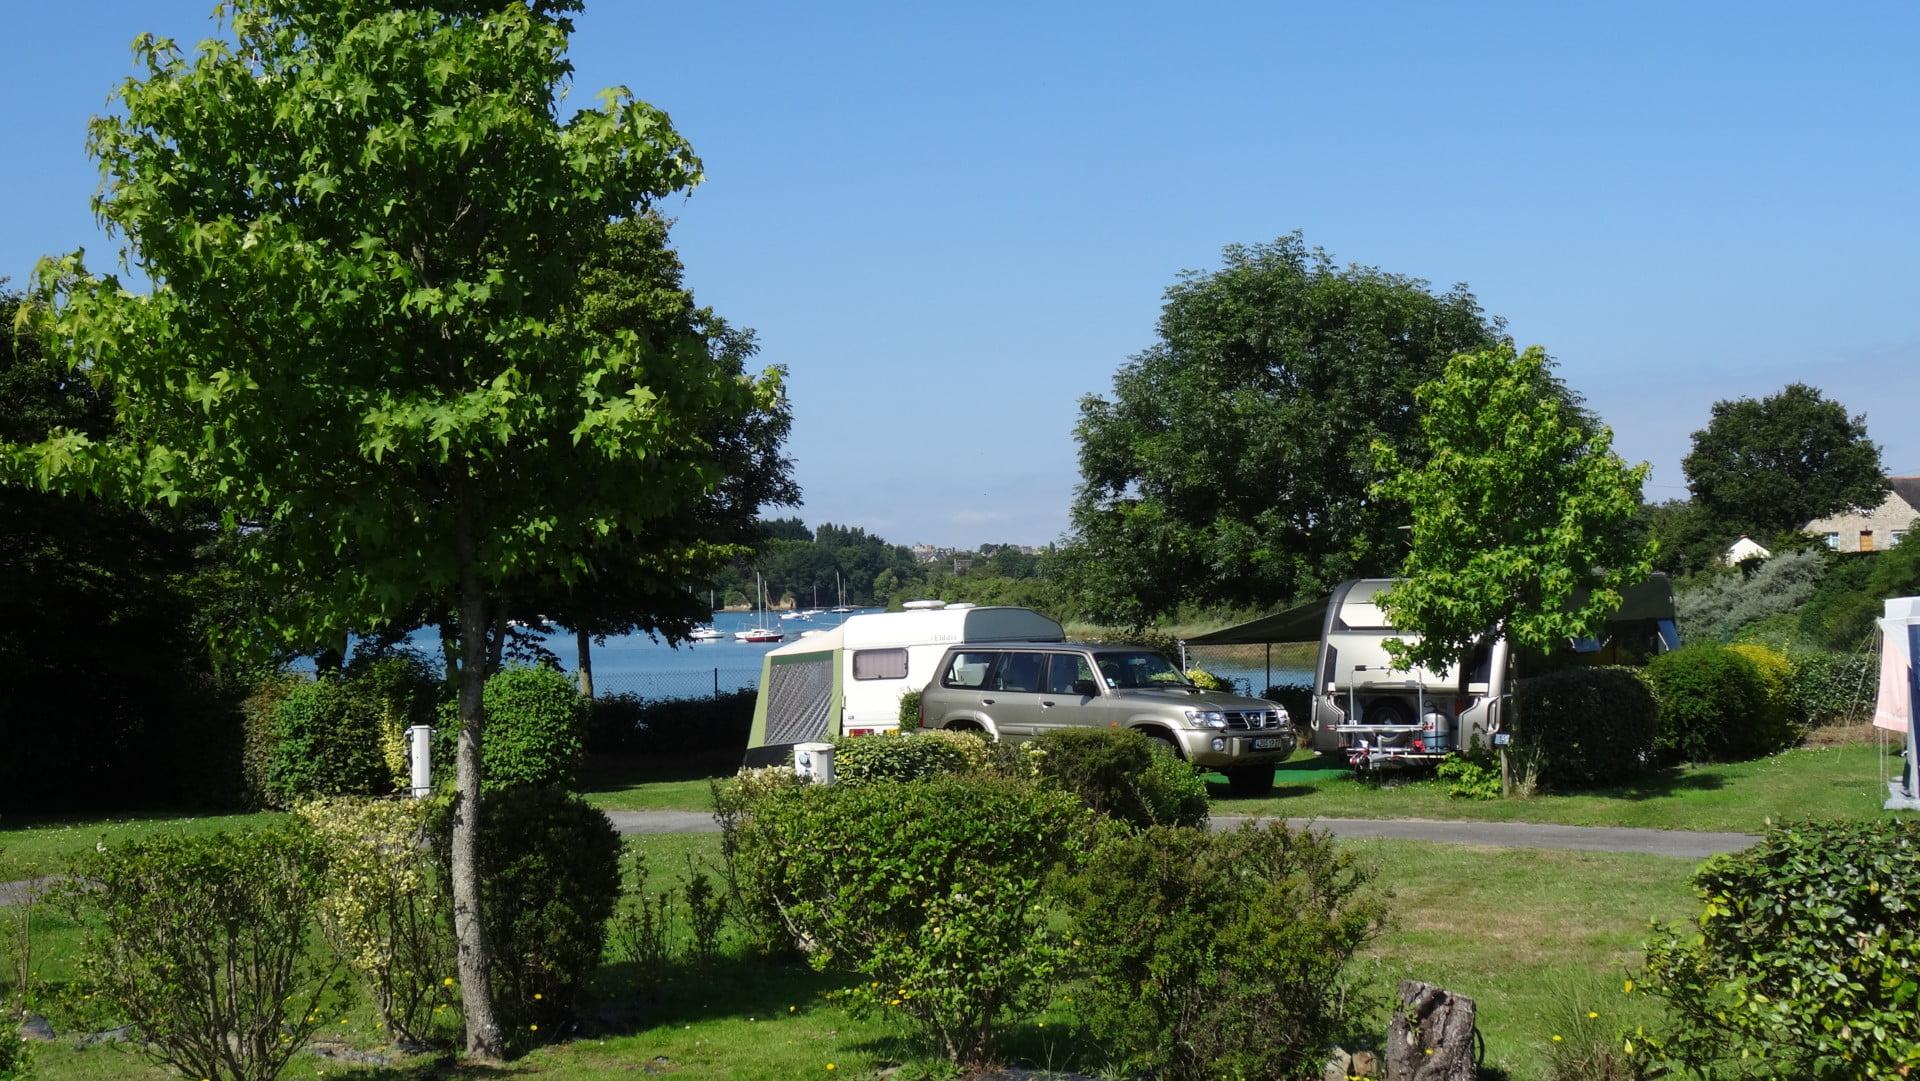 vue mer campingcar détente vue mer camping 2* saint-briac sur mer bretagne